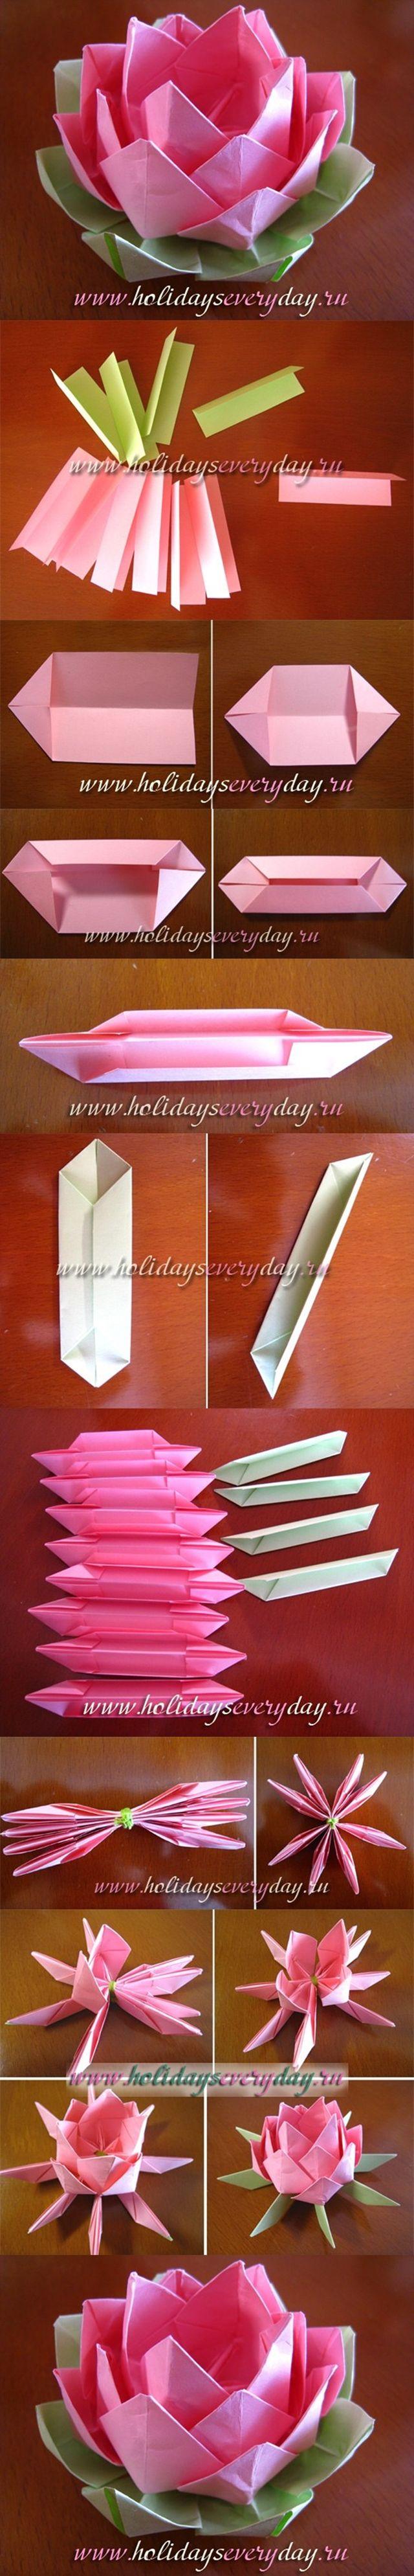 DIY Origami Paper Lotus Flower   www.FabArtDIY.com LIKE Us on Facebook == https://www.facebook.com/FabArtDIY